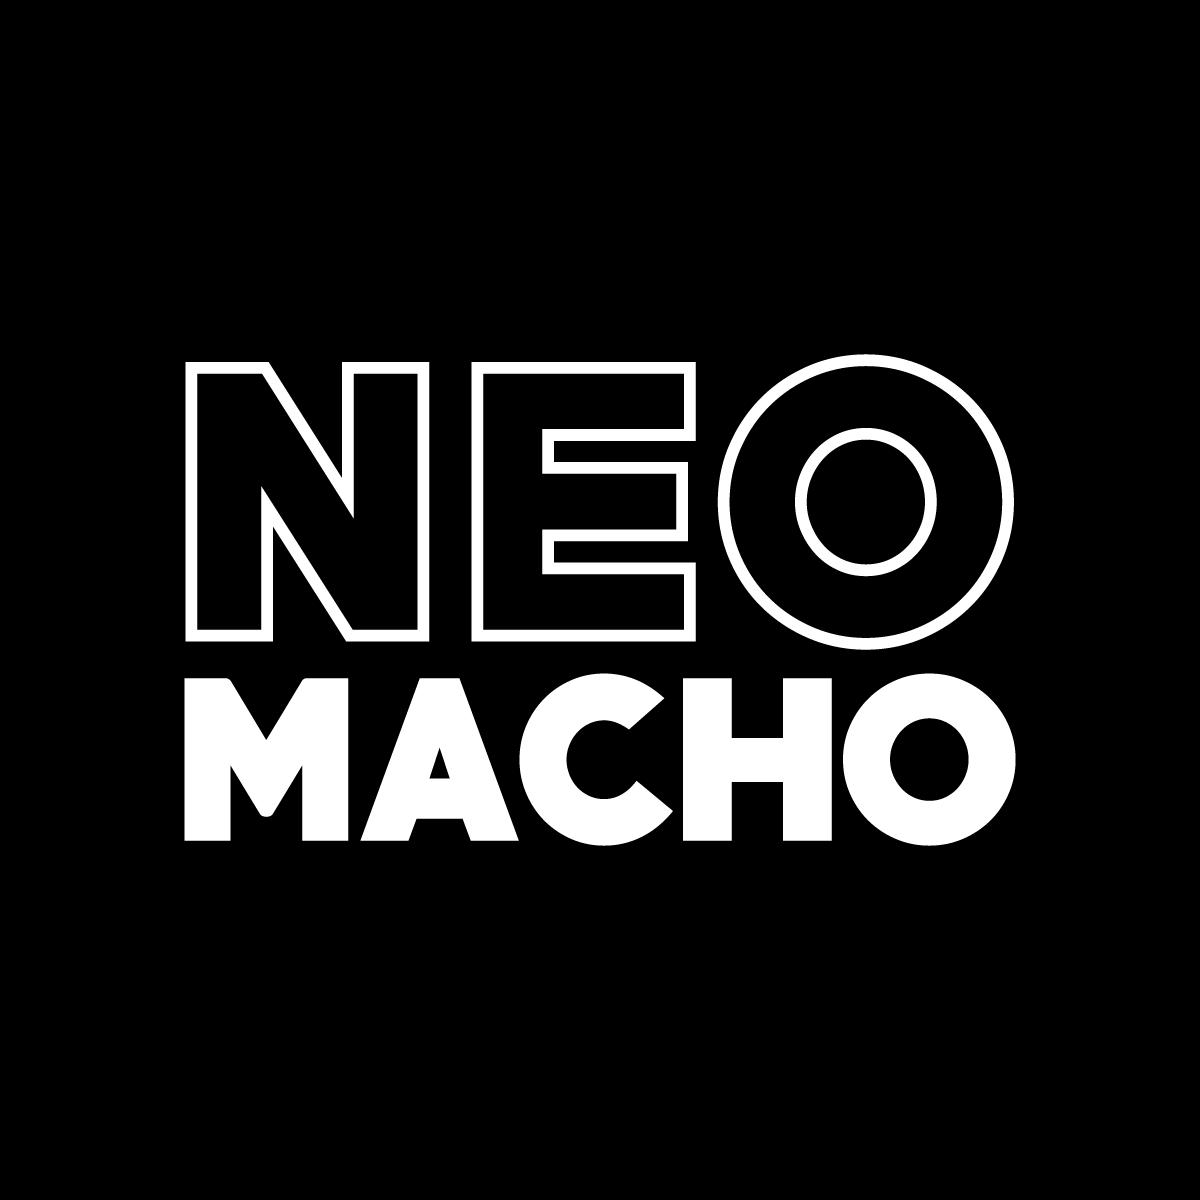 Neo Macho Logo